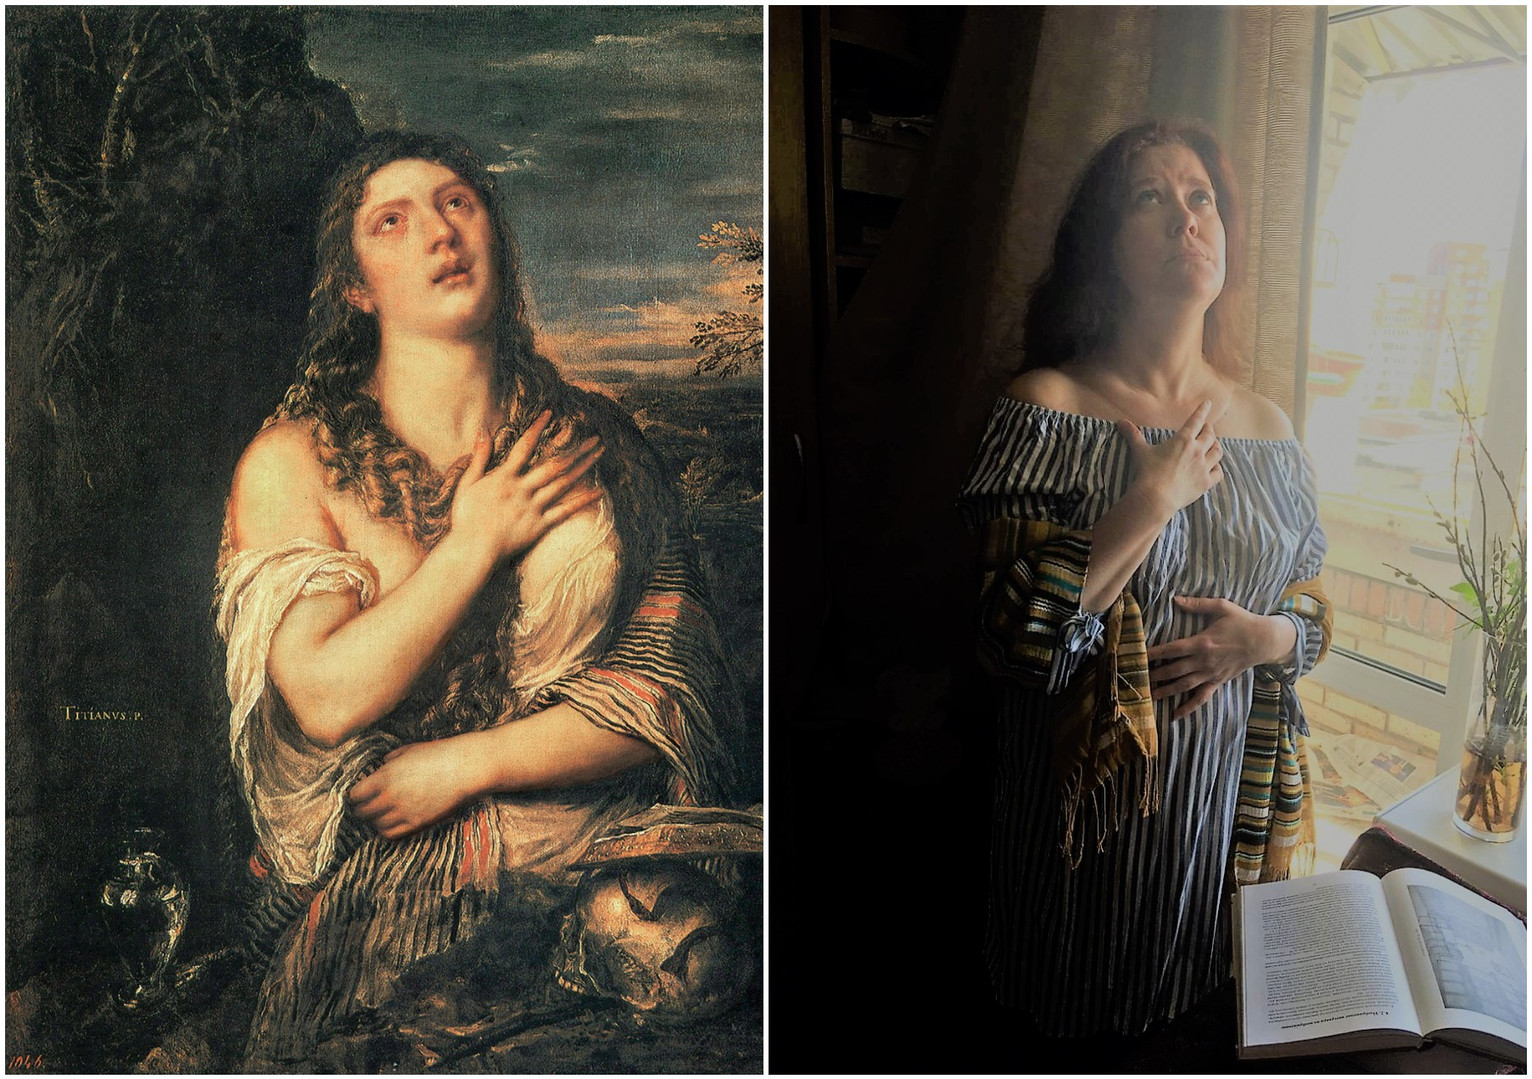 Тициан. Кающаяся Мария Магдалина